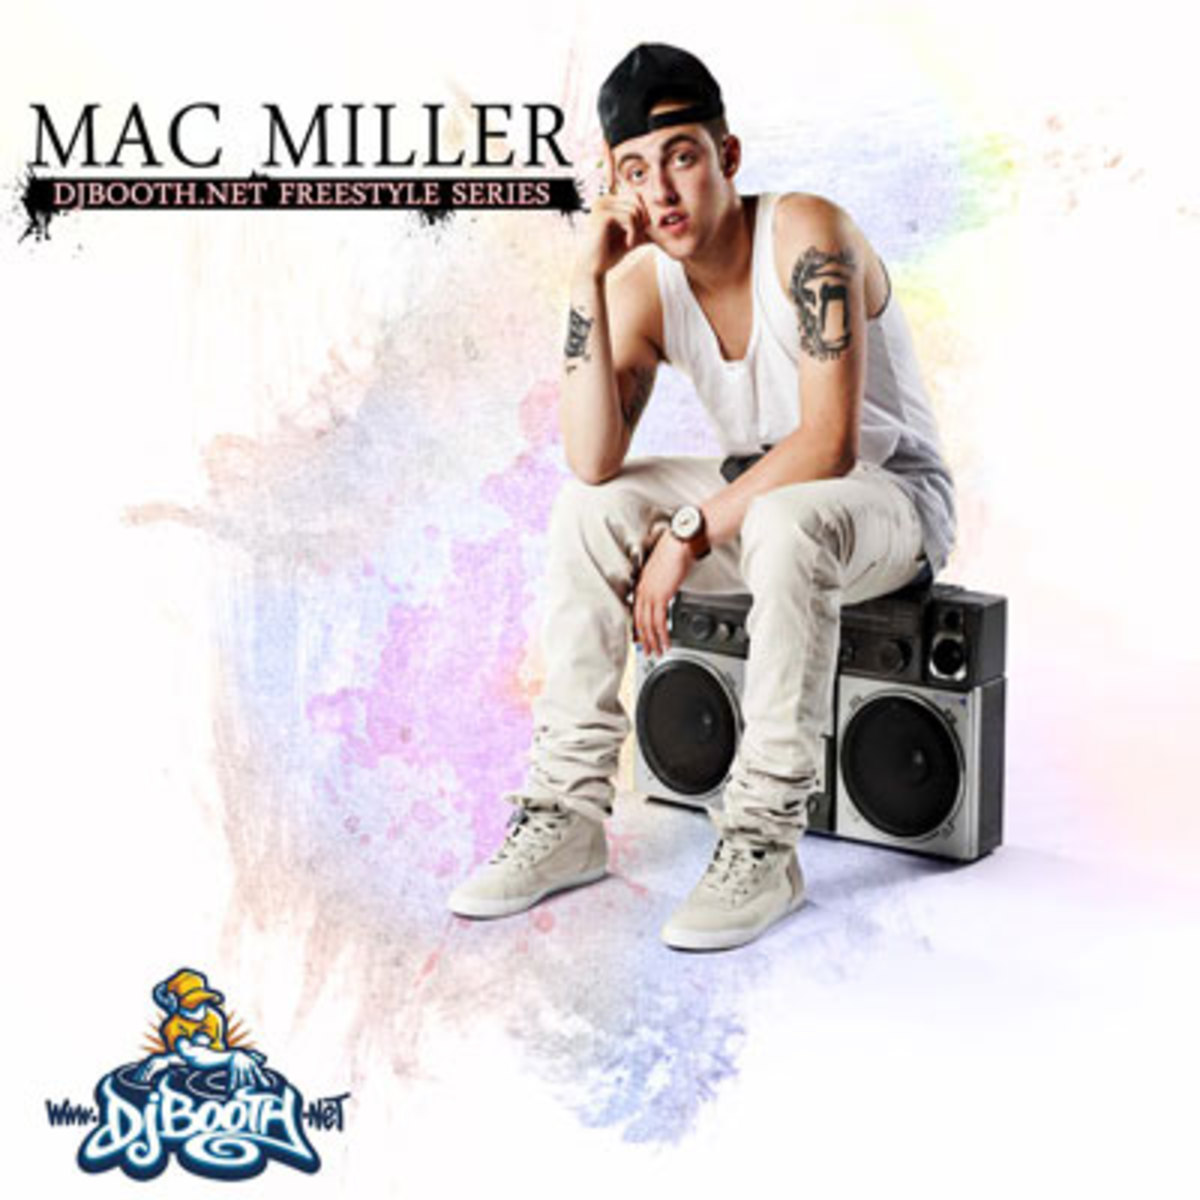 macmiller-freestyle.jpg